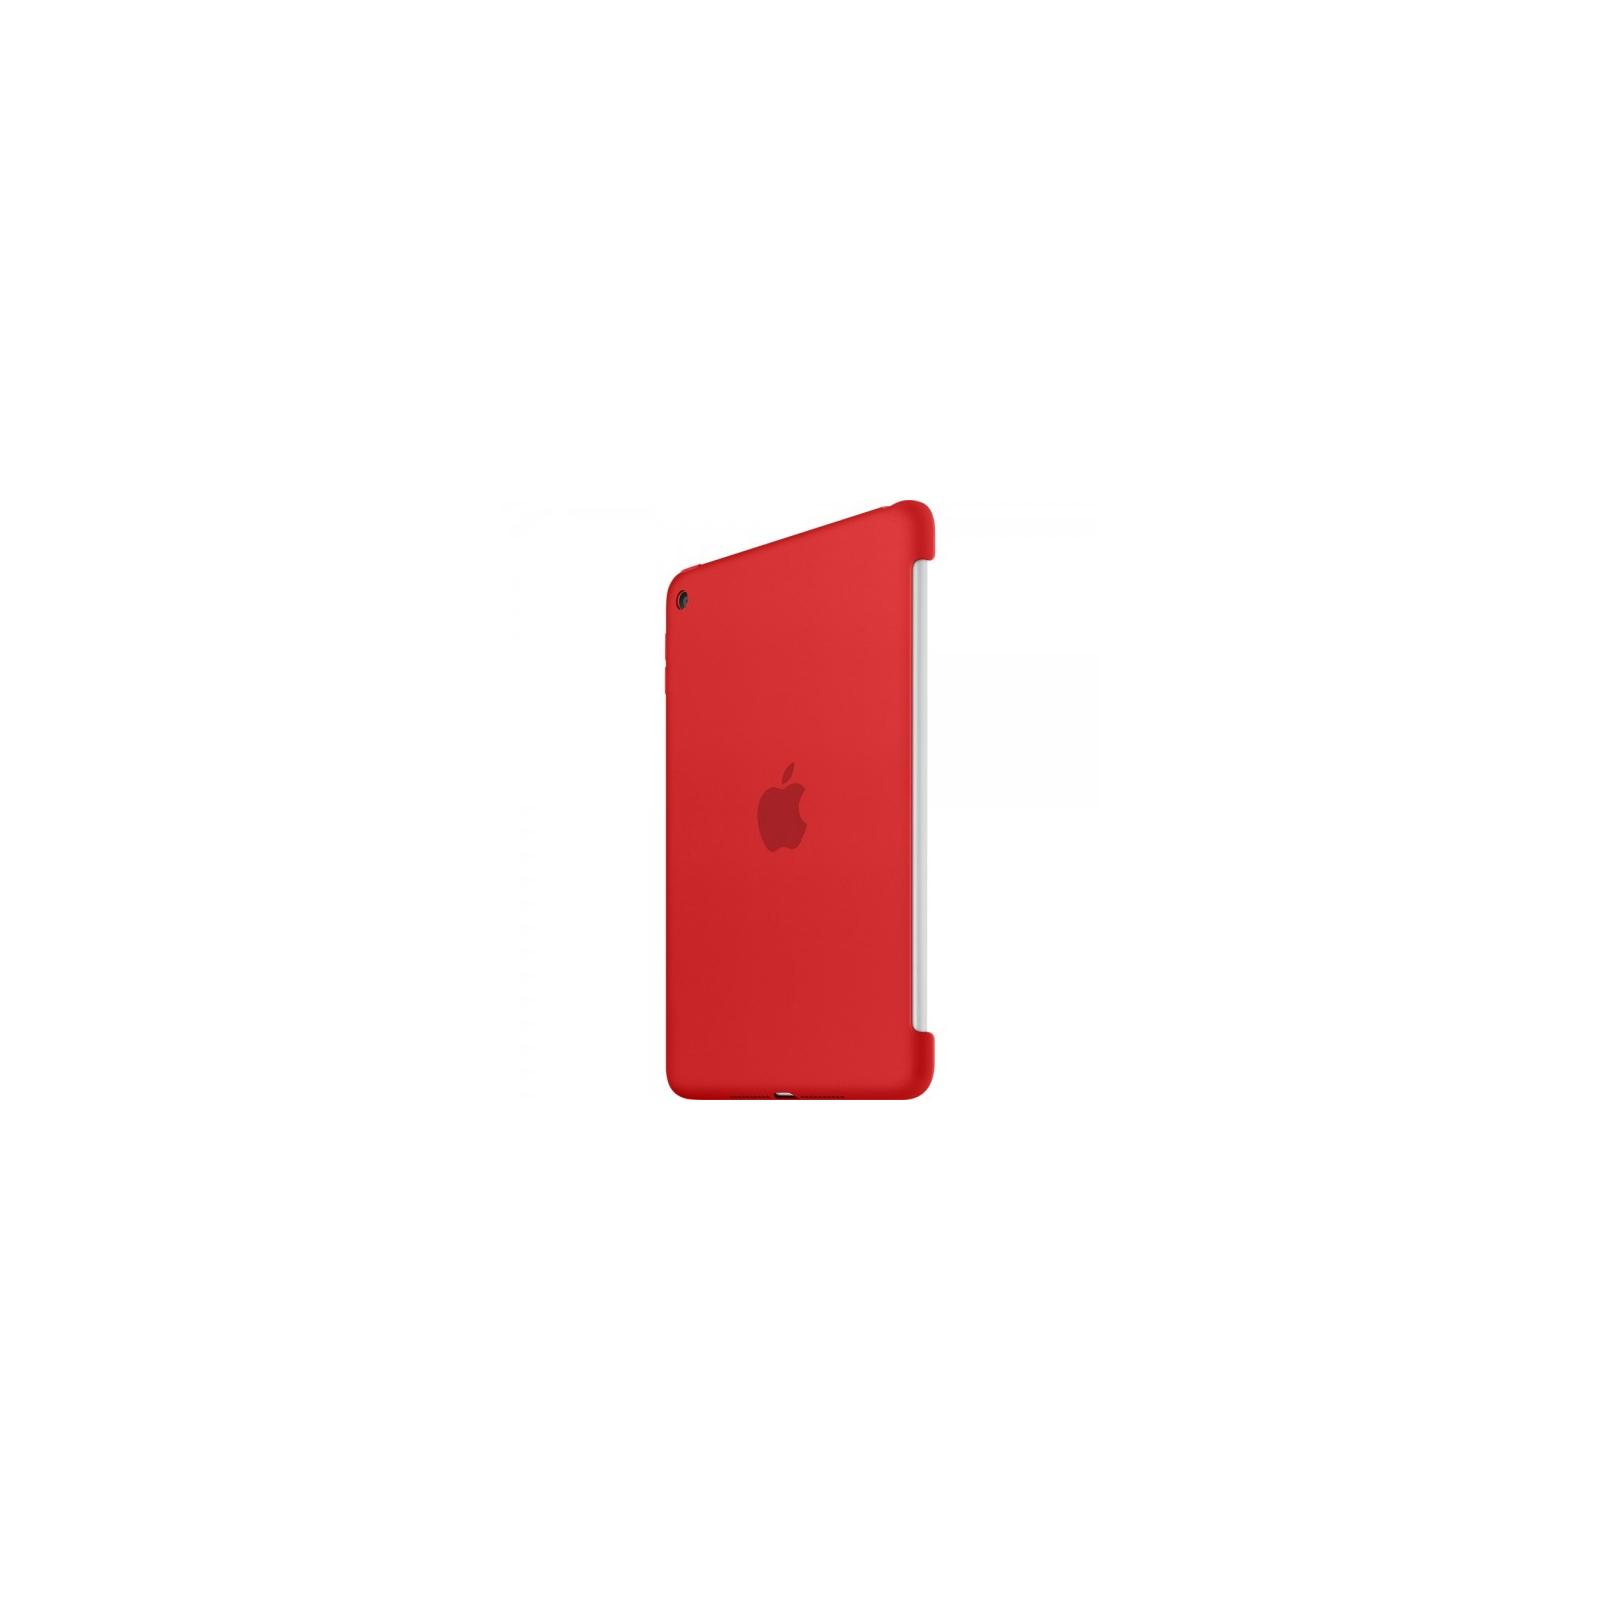 Чехол для планшета Apple iPad mini 4 Red (MKLN2ZM/A) изображение 2